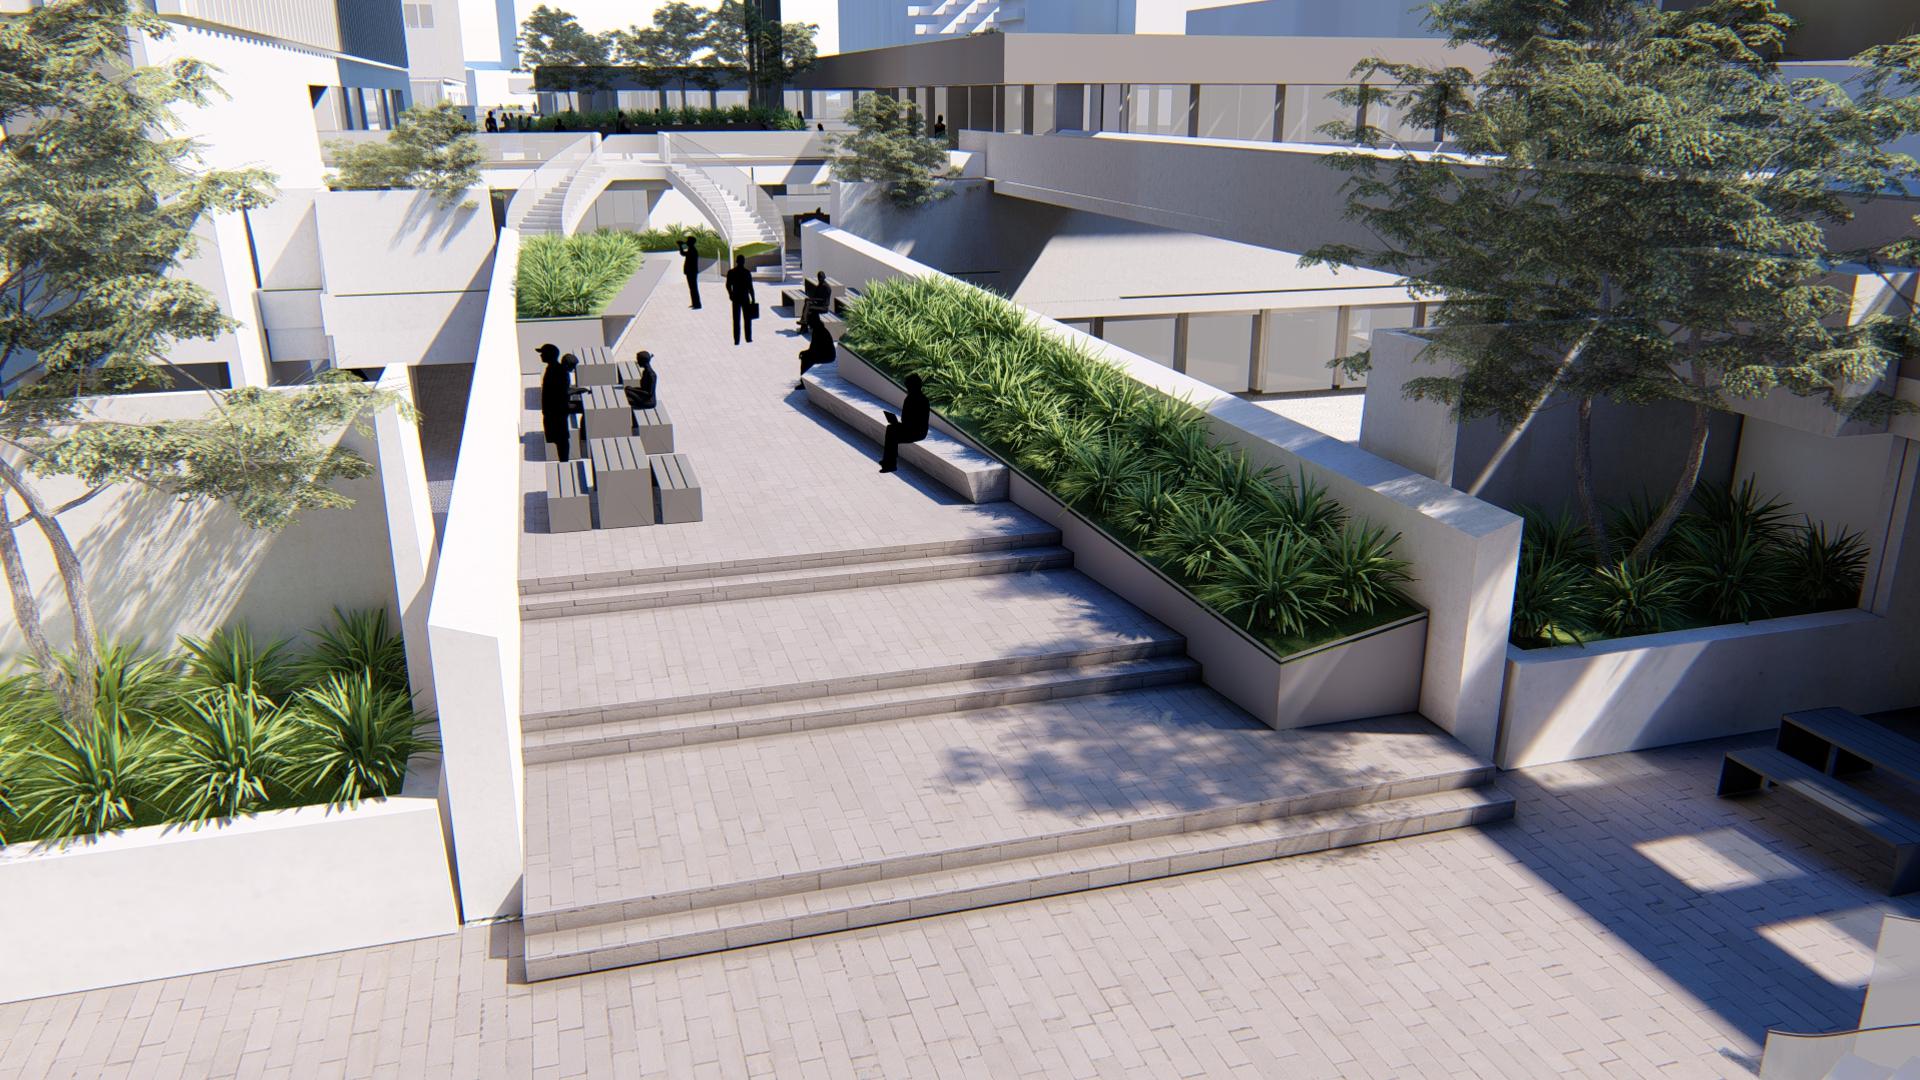 WIP_plaza on podium (3).jpg